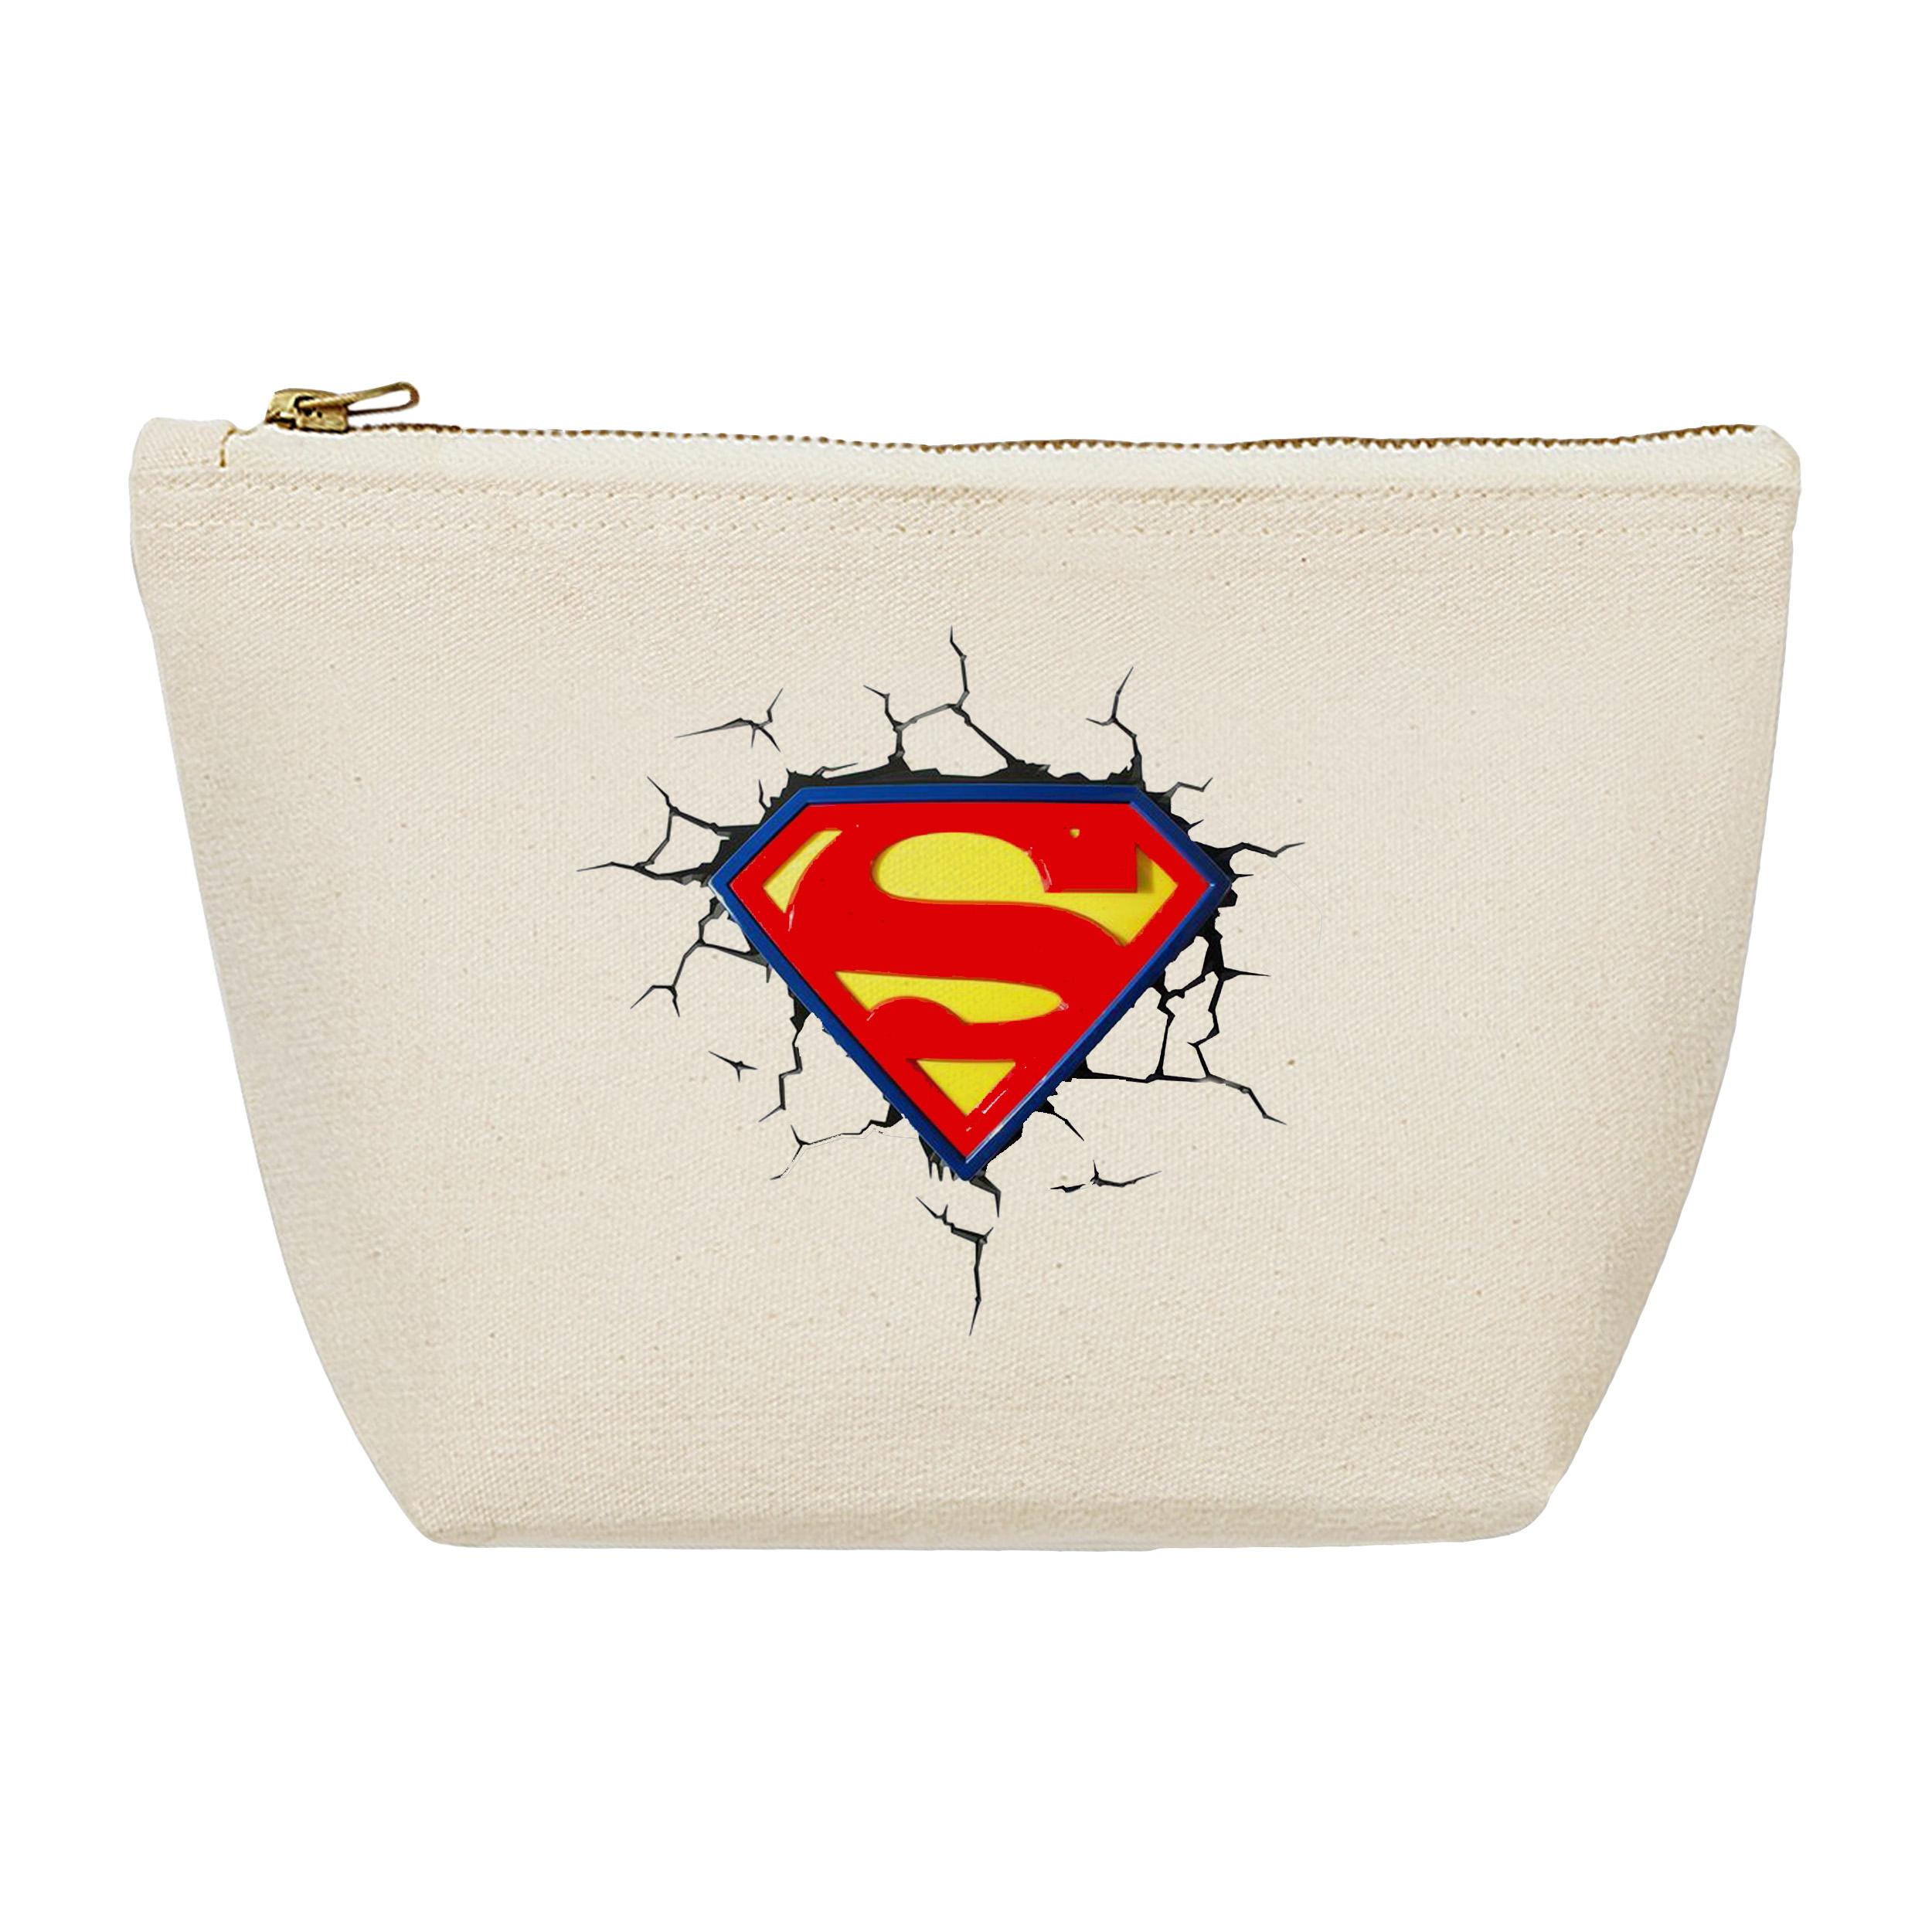 جامدادی طرح قهرمانان سوپرمن کد 269